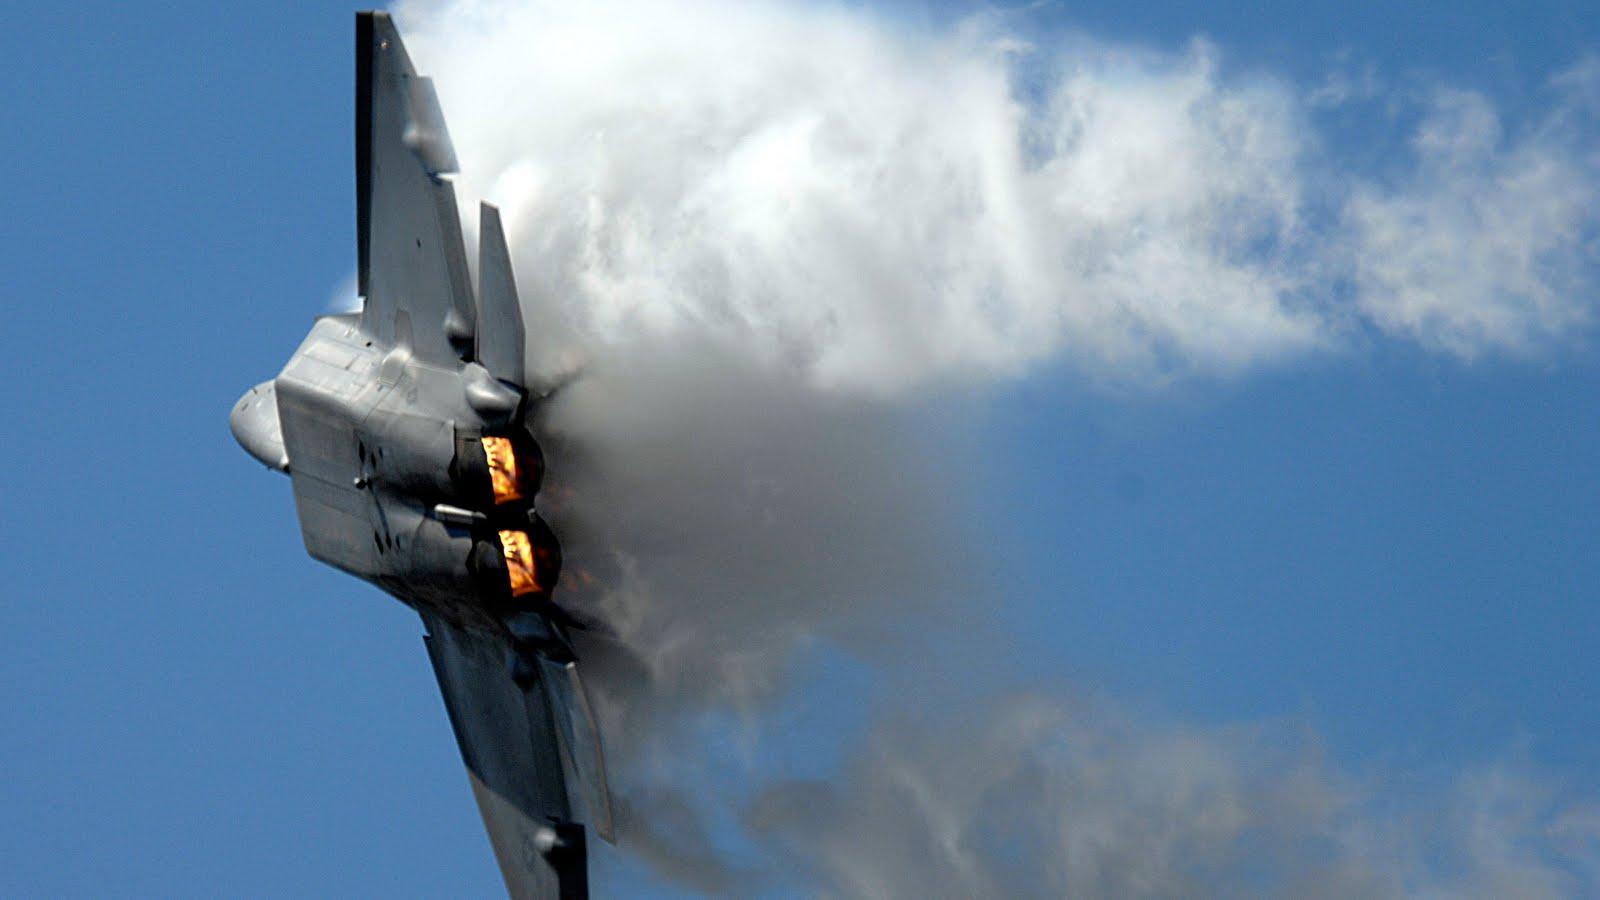 http://4.bp.blogspot.com/_ja676MG45Zg/S_qN6O7Hd9I/AAAAAAAADd0/VB-IXL2ld4g/s1600/f-22-raptor-amazing-maneuver.jpg